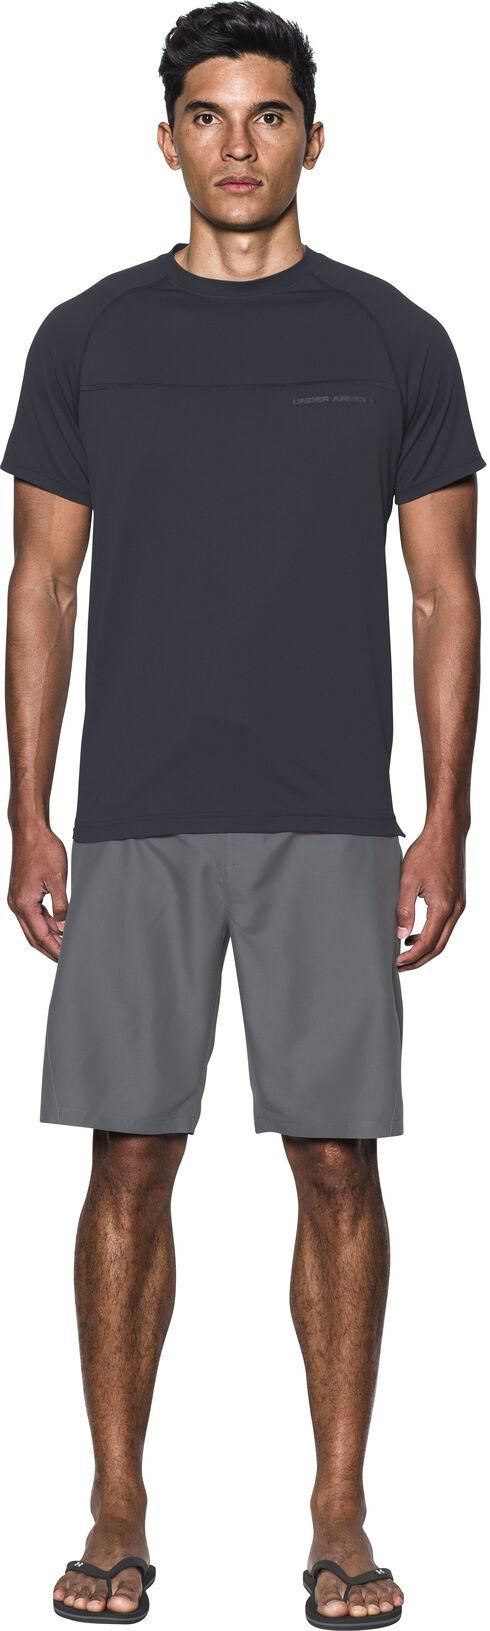 Under Armour Men's Charcoal Grey Mania Board Shorts, Charcoal Grey, hi-res